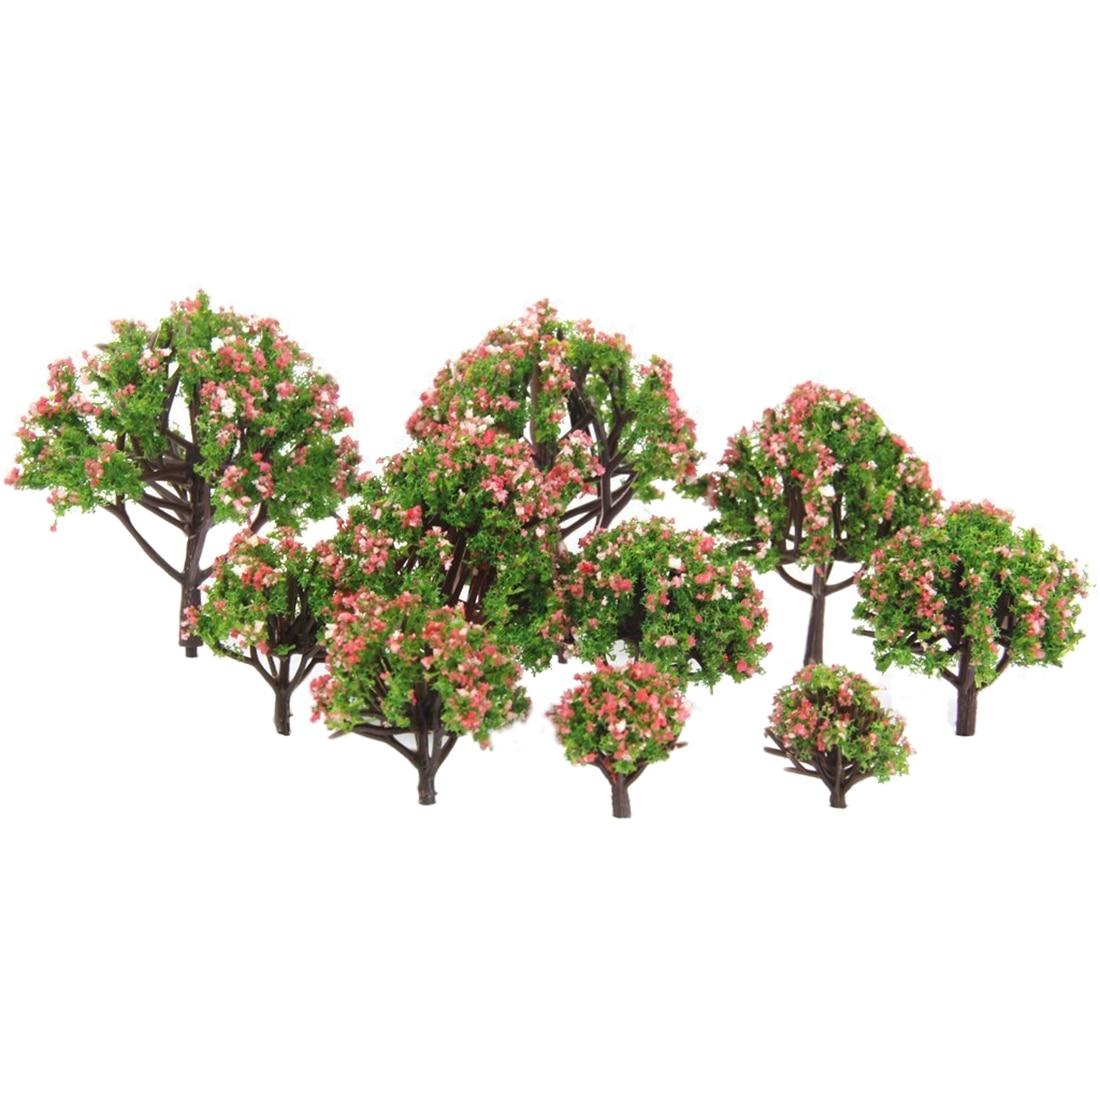 ABWE Plastic peach trees model railway railway landscape scale 1:75 - 1: 500